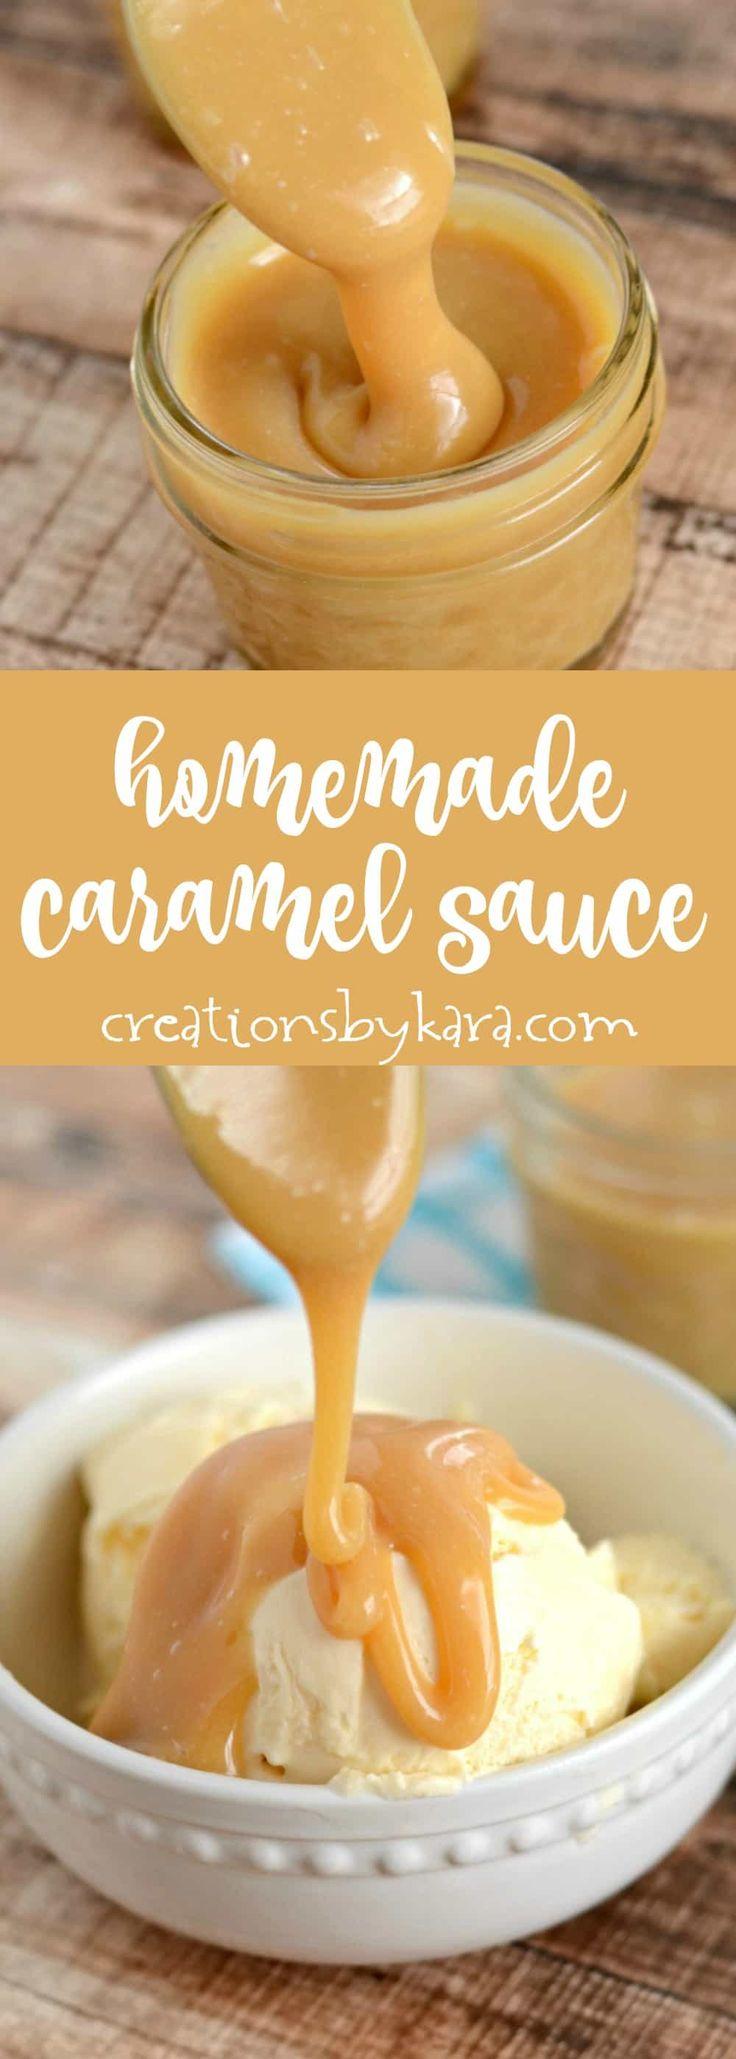 Homemade Caramel Sauce - Copycat Leatherby's caramel ice cream sauce. This caramel sauce is incredible!